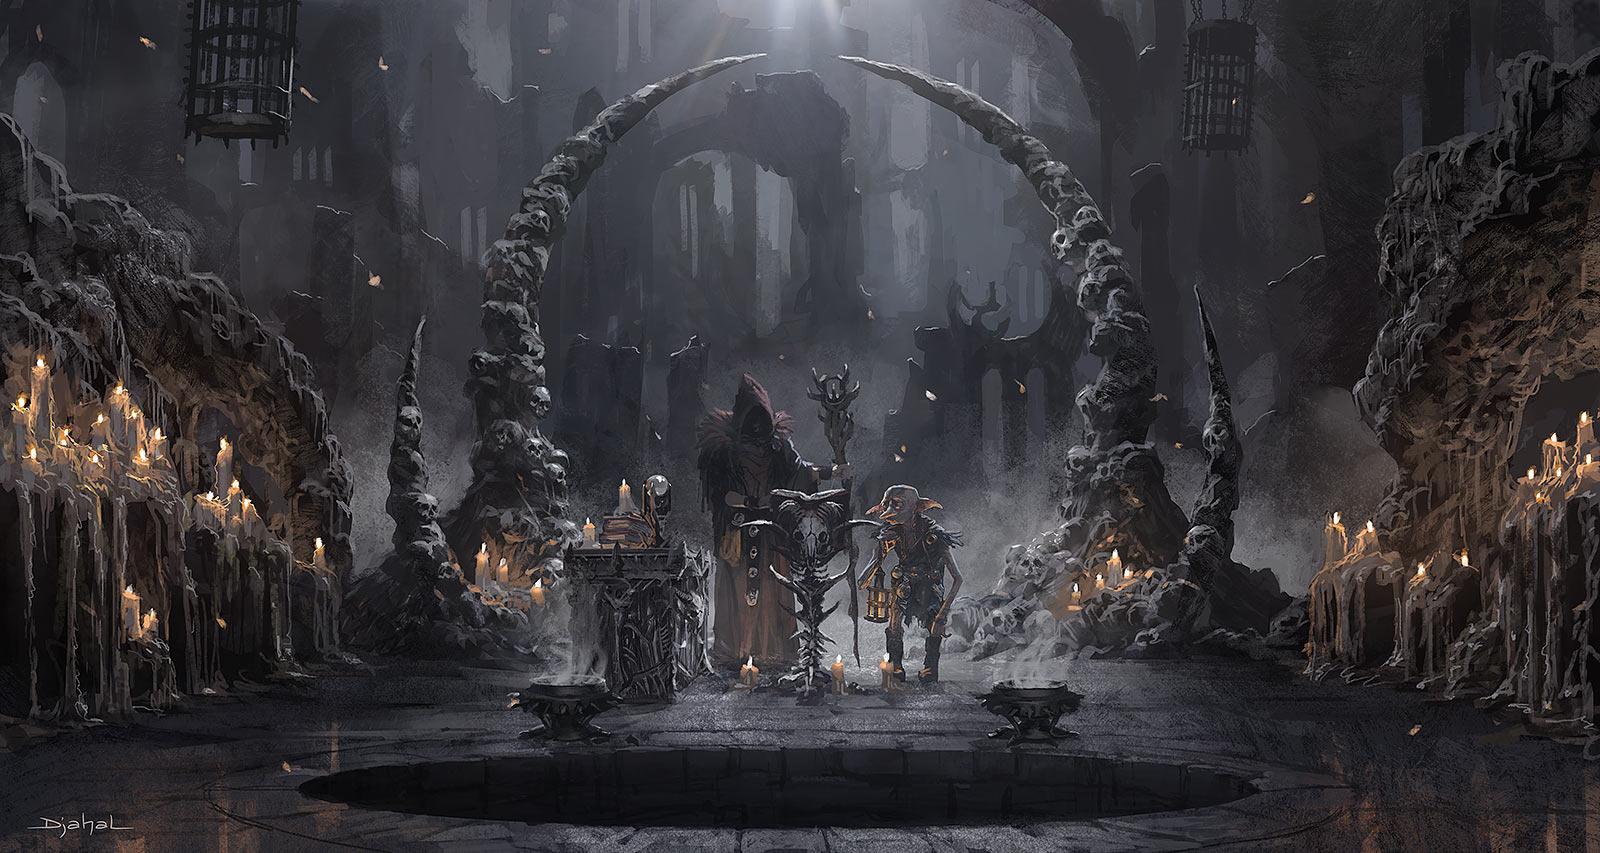 geoffroy-thoorens-fantasy-artist.jpg